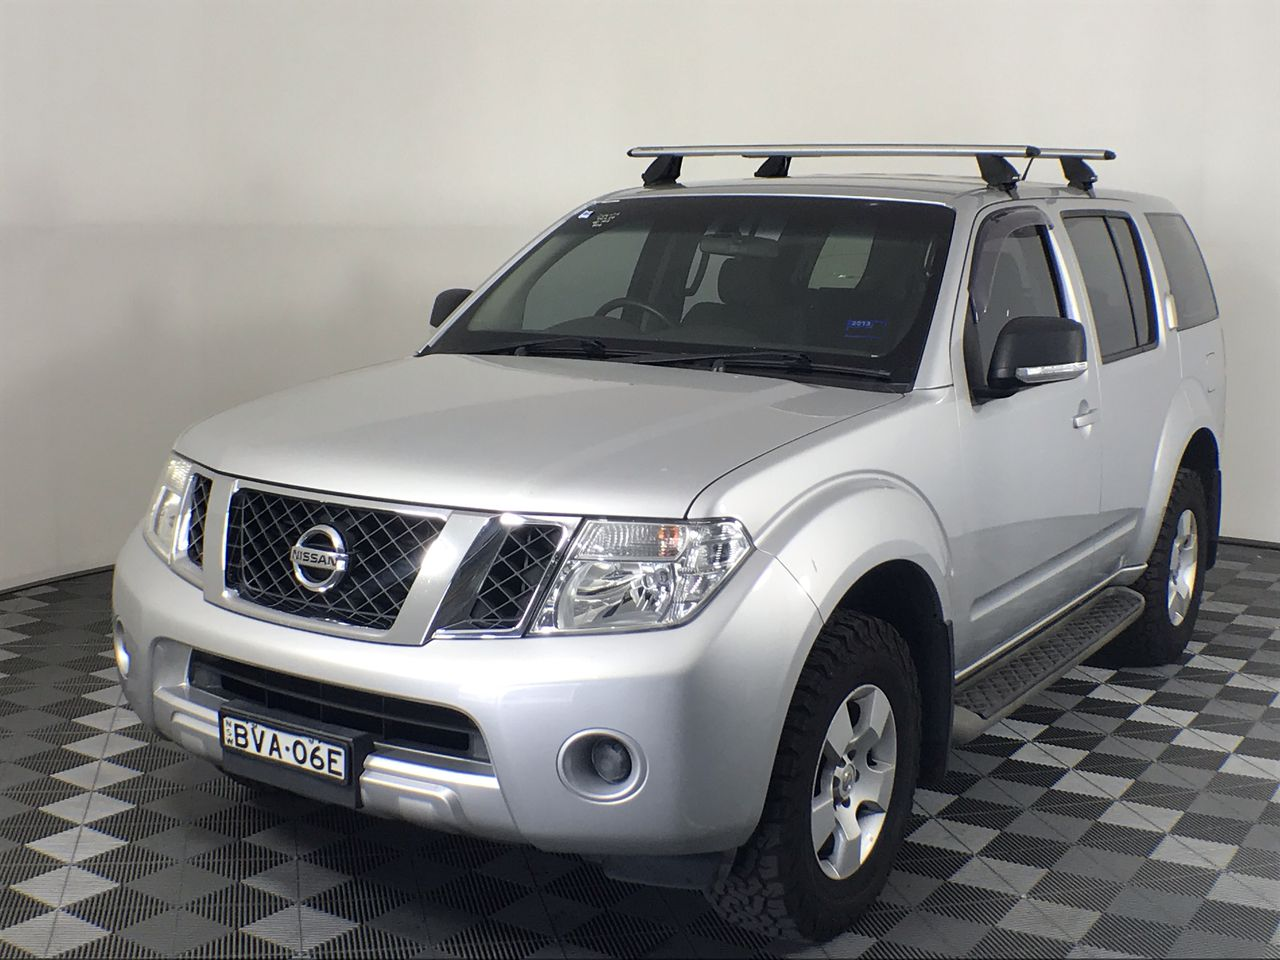 2010 Nissan Pathfinder ST (4x4) R51 Automatic 7 Seats Wagon